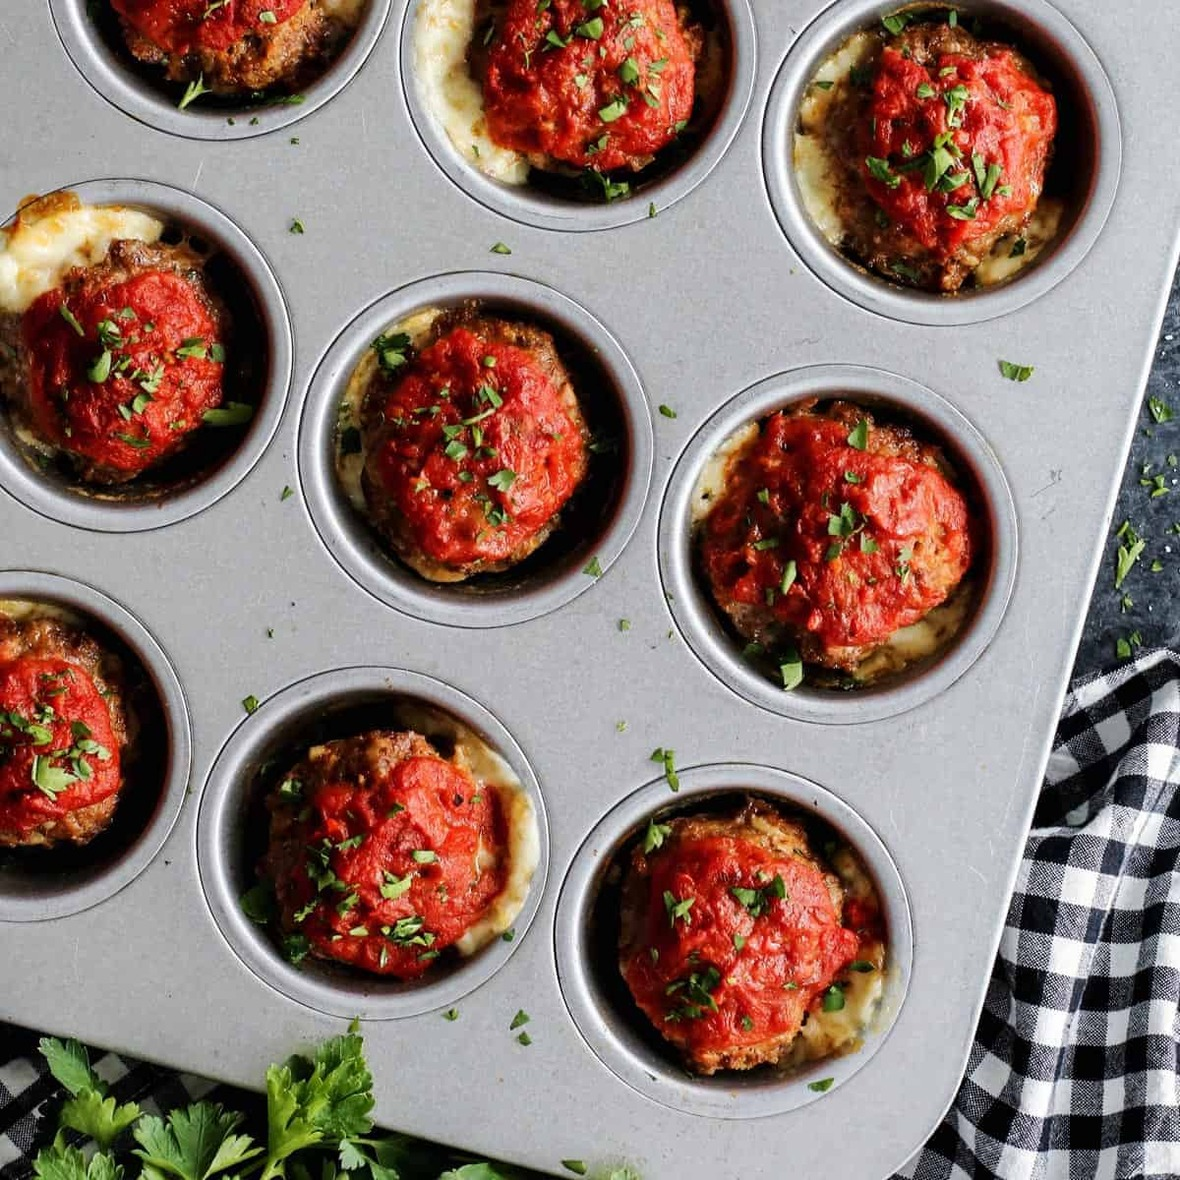 cheesy-italian-meatloaf-muffins AFarmgirlsDabbles AFD-4-sq